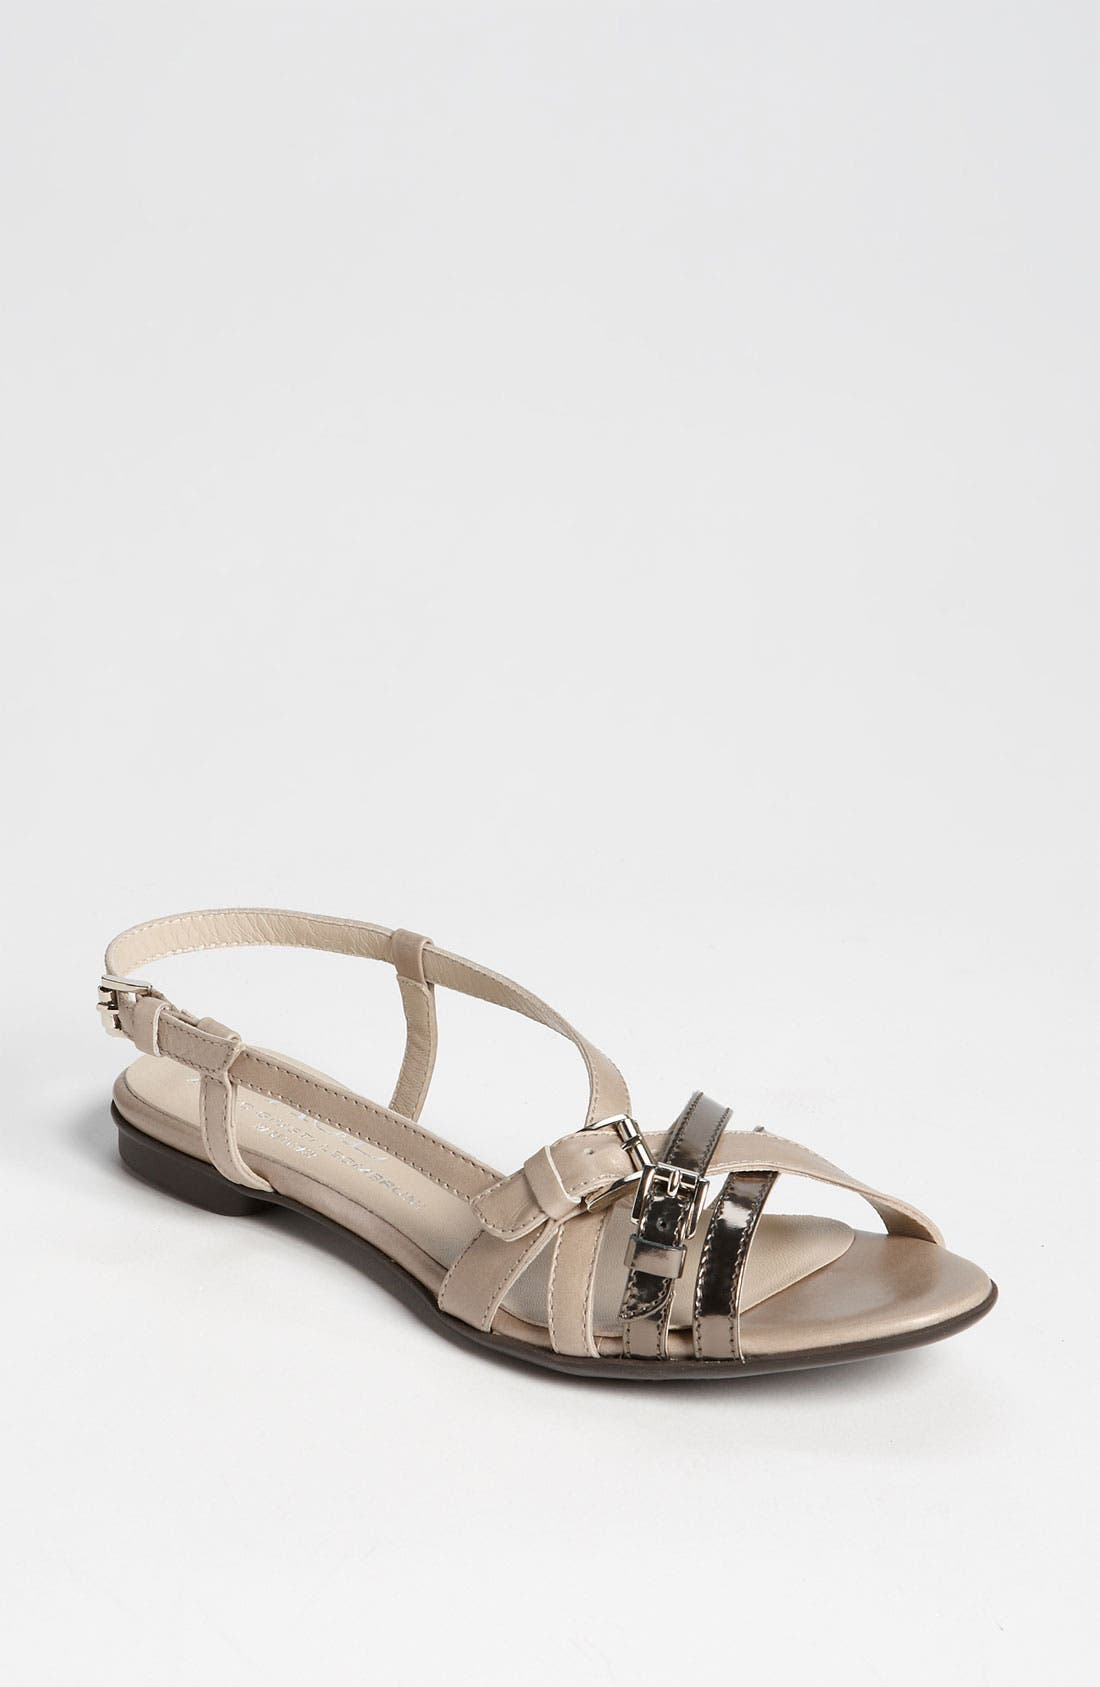 Alternate Image 1 Selected - Attilio Giusti Leombruni Belted Sandal